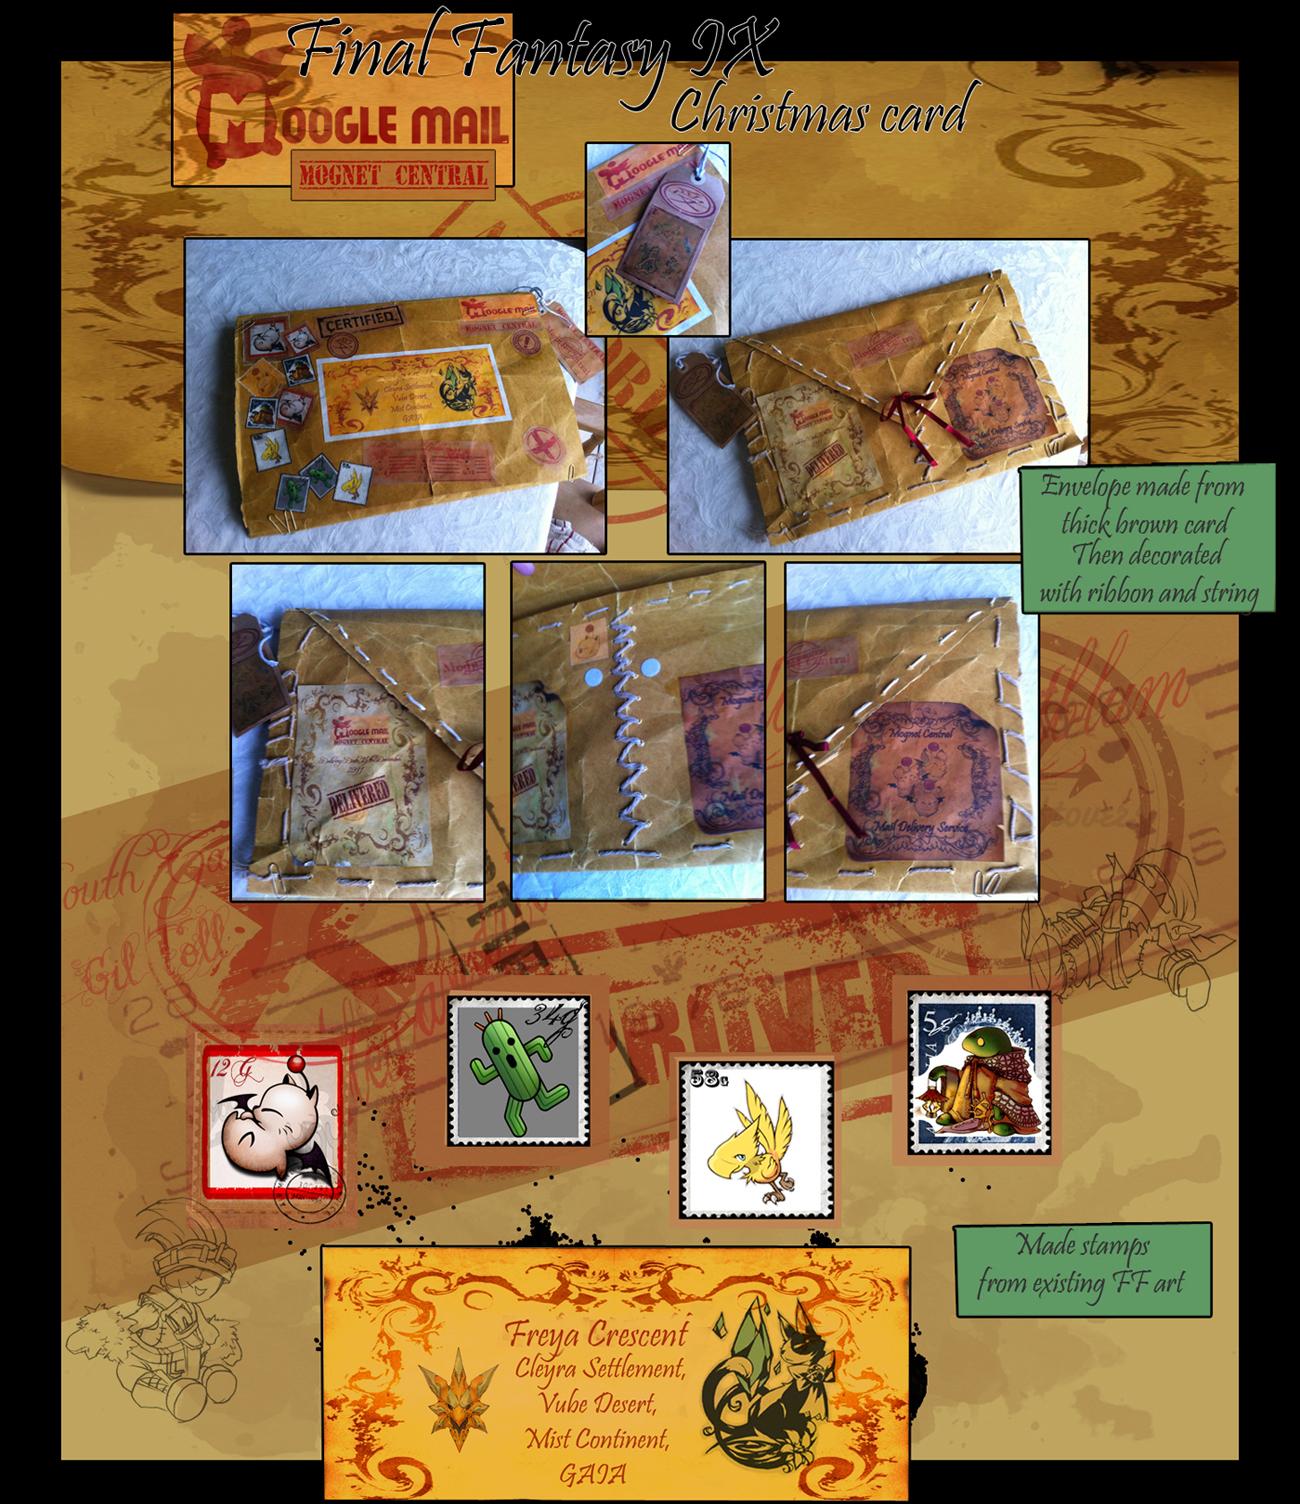 Neversummer Nights: Final Fantasy IX Christmas Card